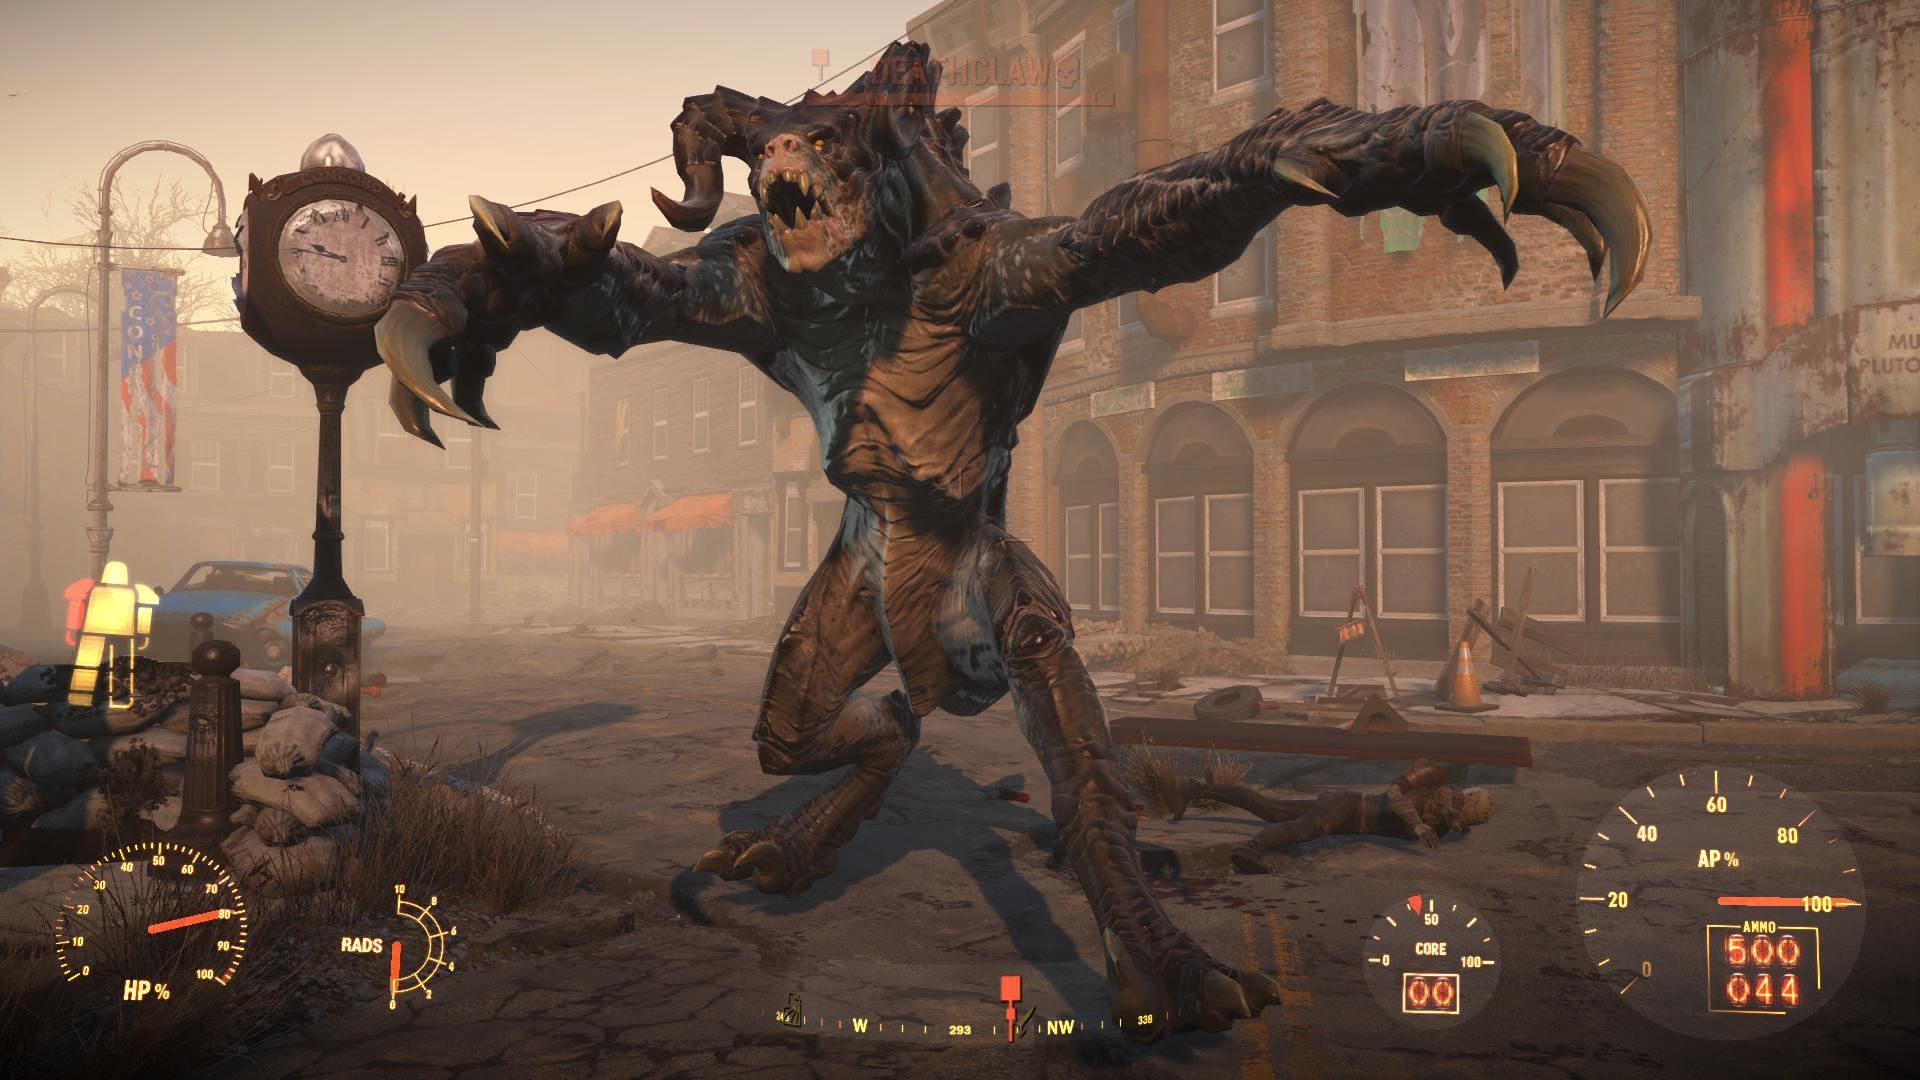 Fallout4-Deathclaw 2 by GiuseppeDiRosso Fallout4-Deathclaw 2 by  GiuseppeDiRosso